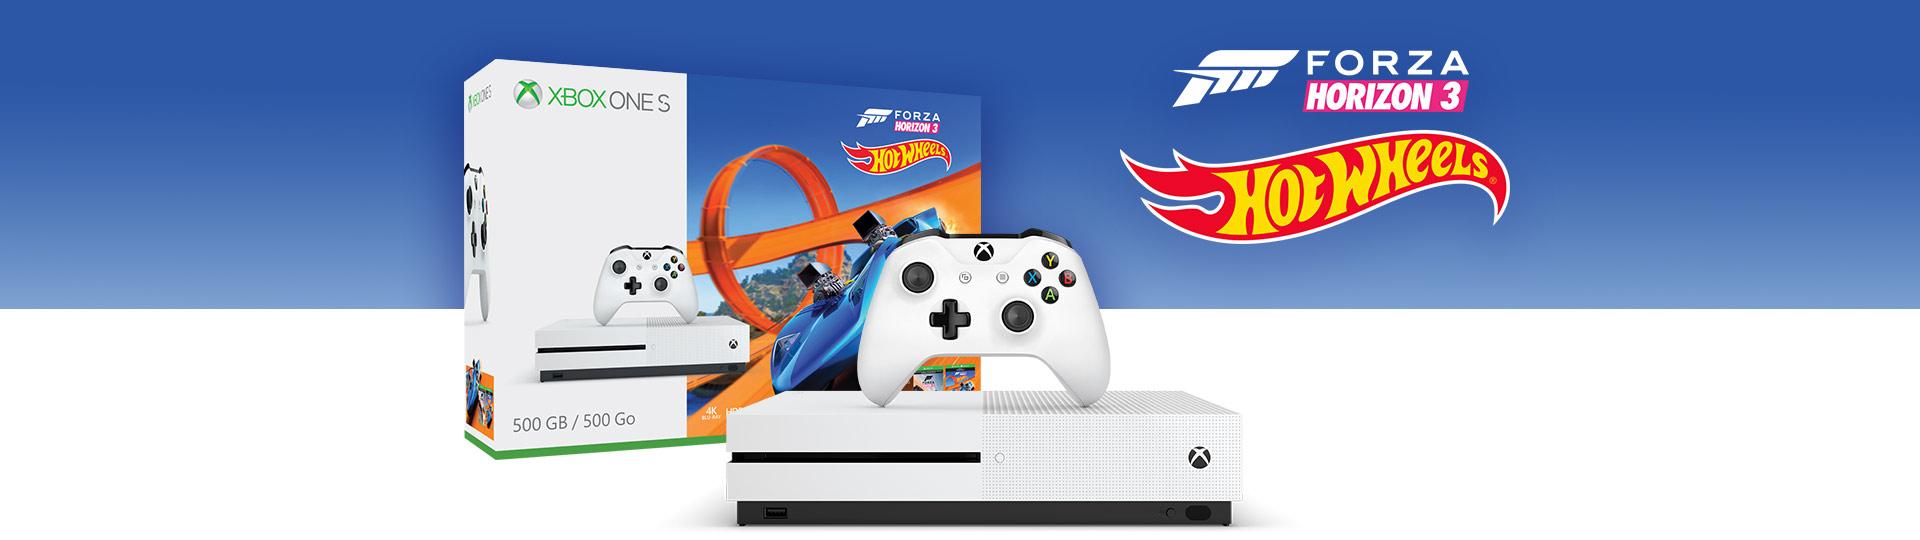 Xbox One S Forza Horizon 3 Hot Wheels Bundle (500GB)